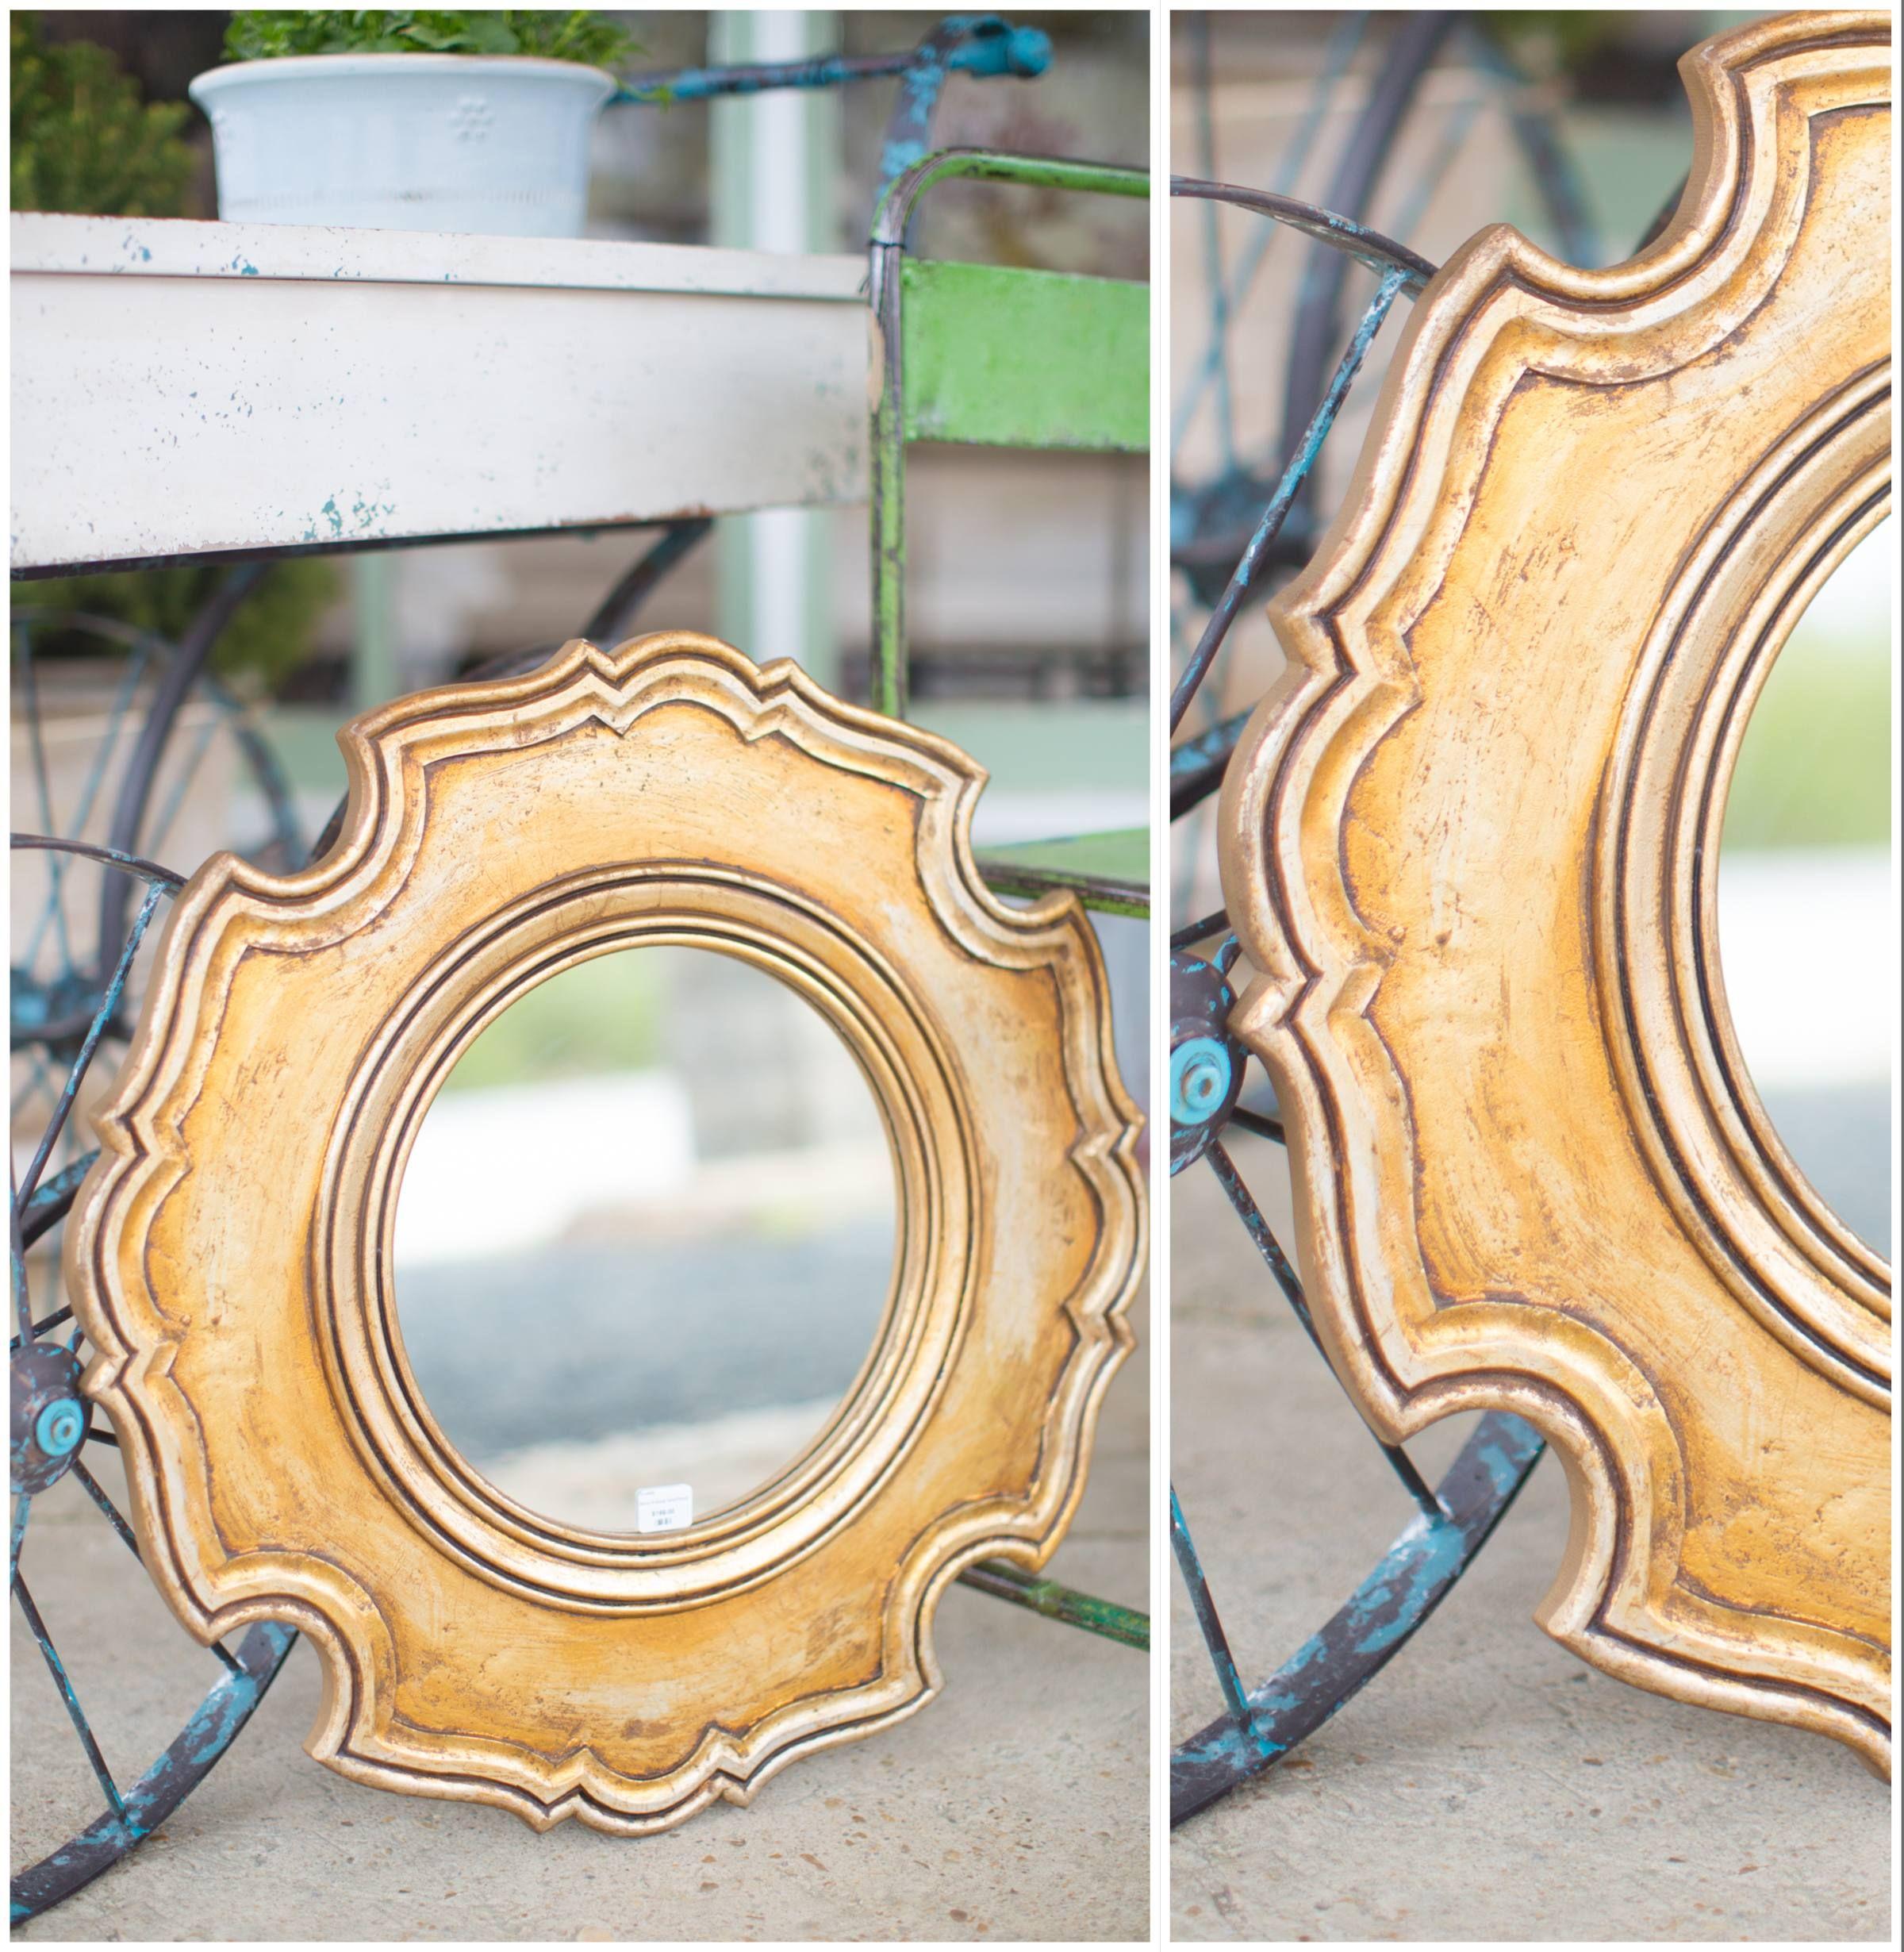 Geometric Shapes In Interior Design Lovely Furnishings Pinterest Furniture Design